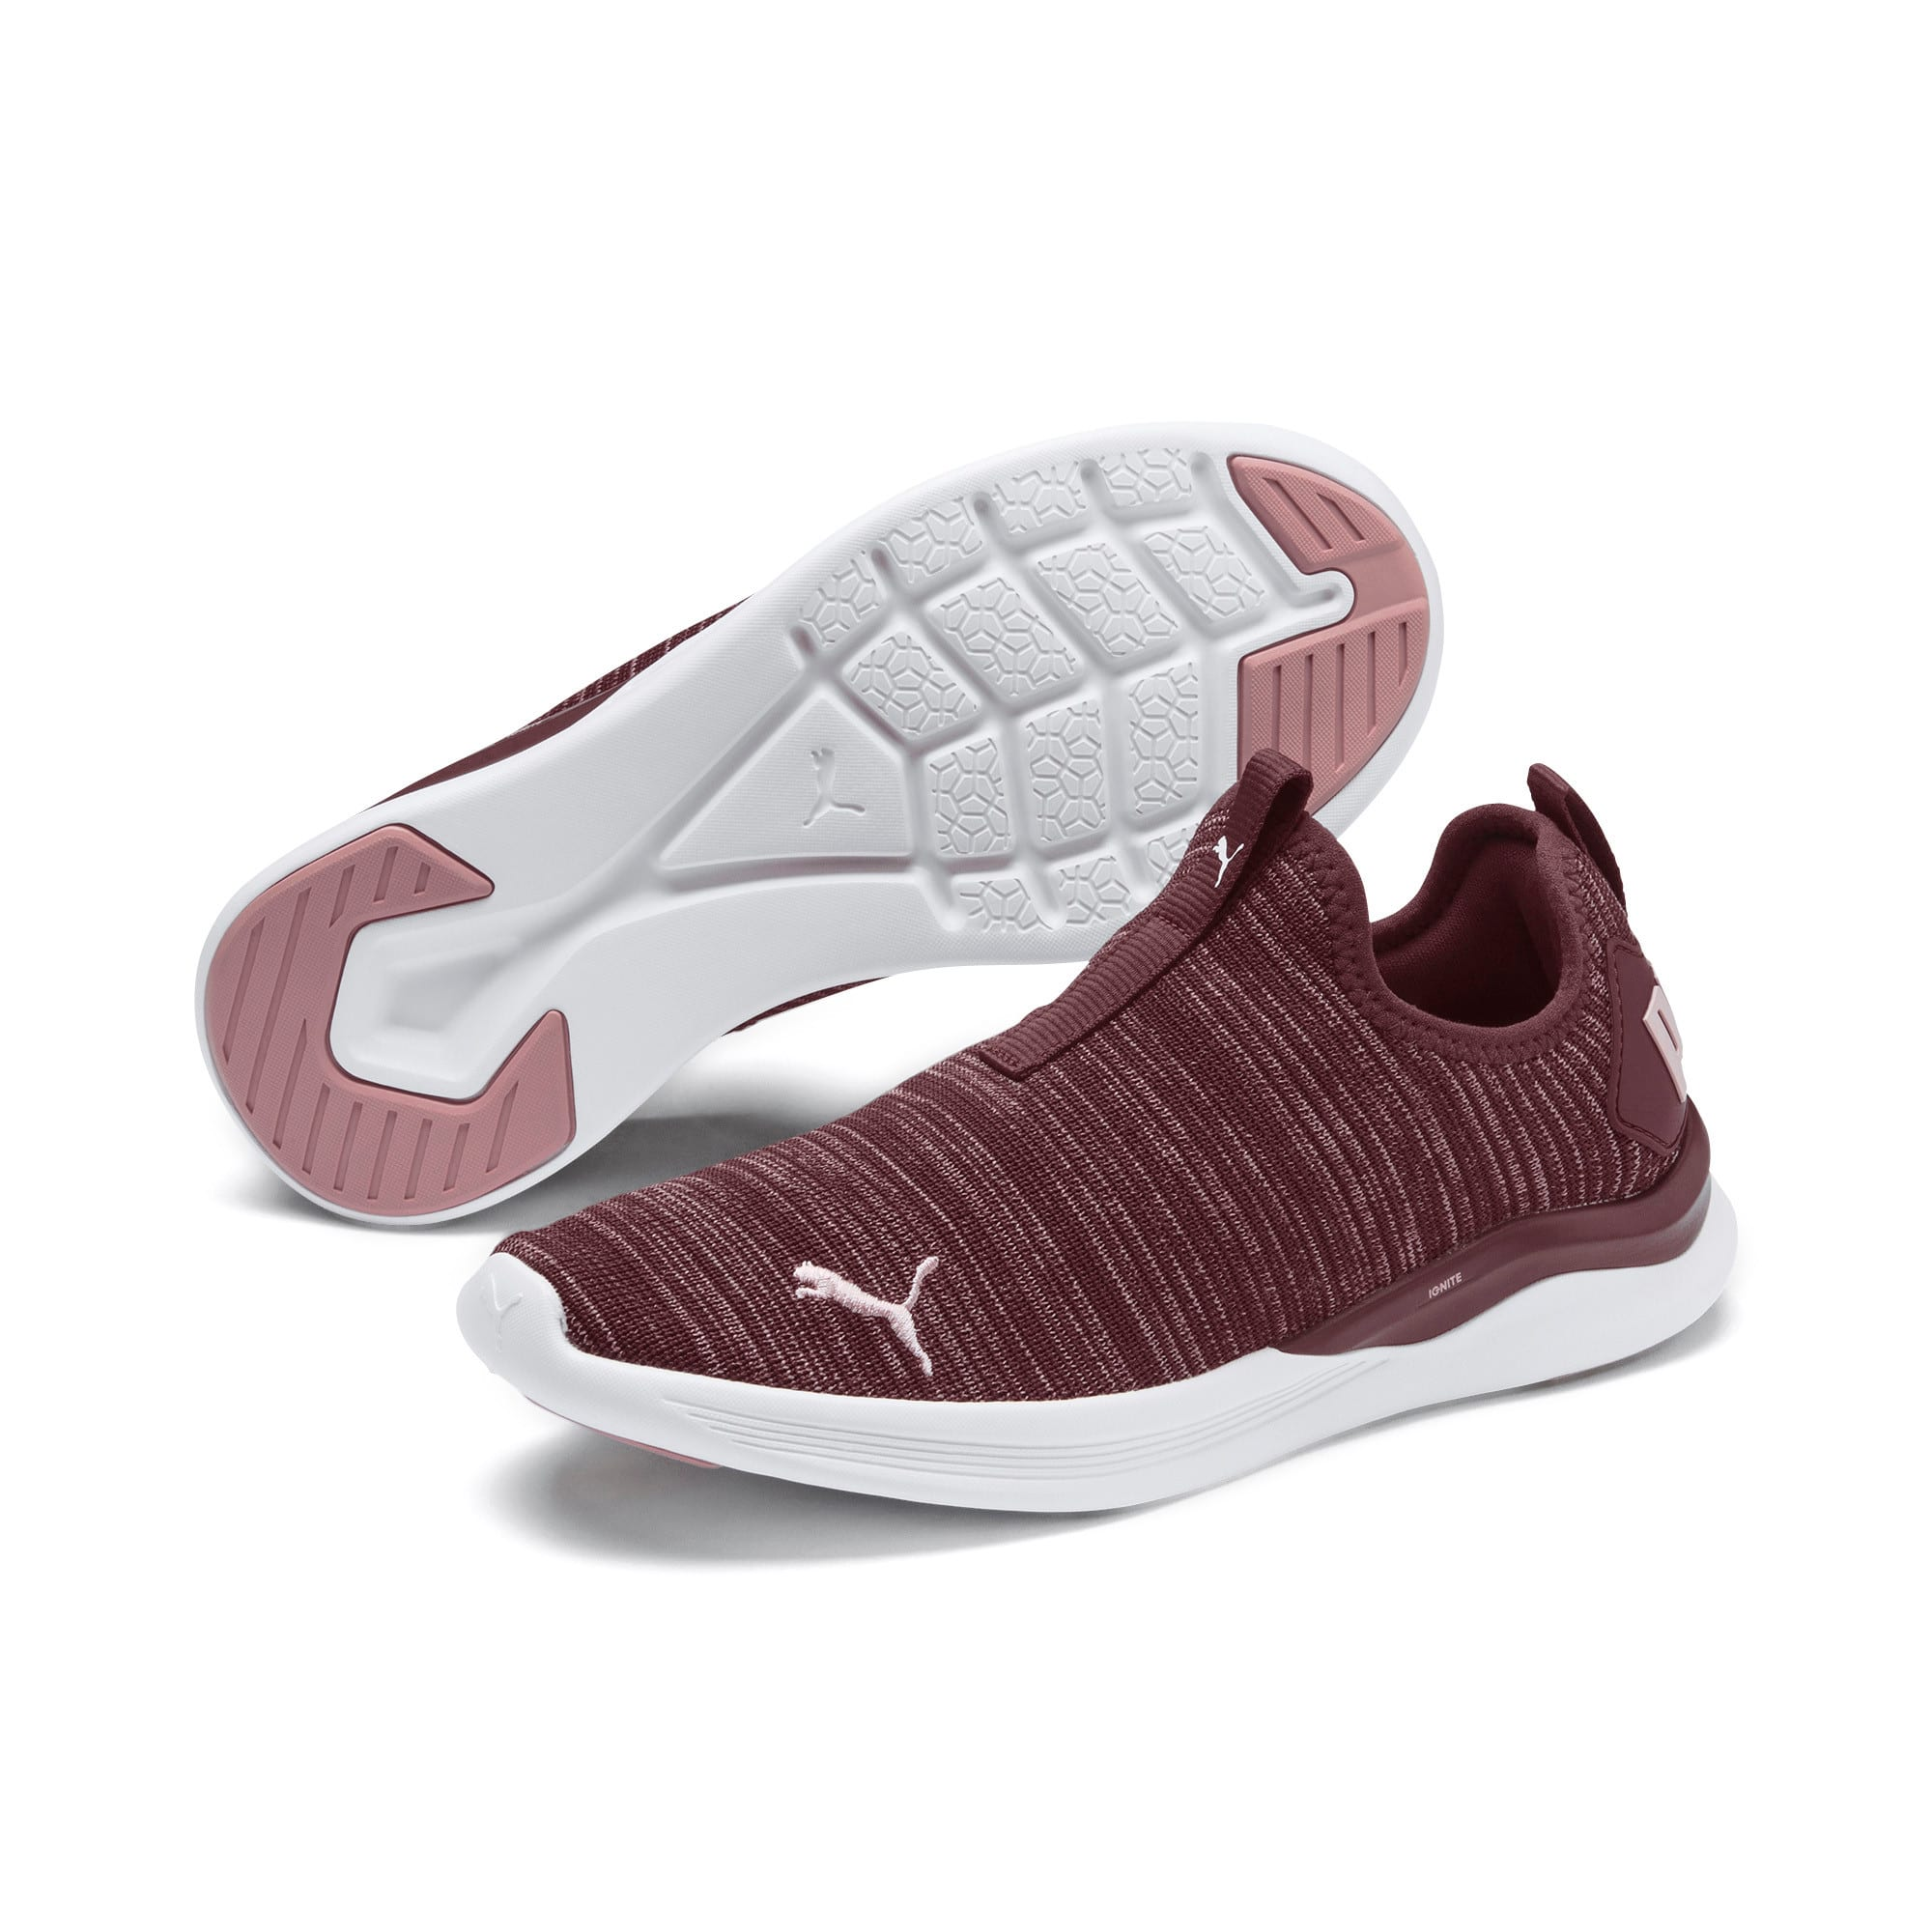 Thumbnail 2 of IGNITE Flash Summer Slip Women's Training Shoes, Vineyard Wine-Bridal Rose, medium